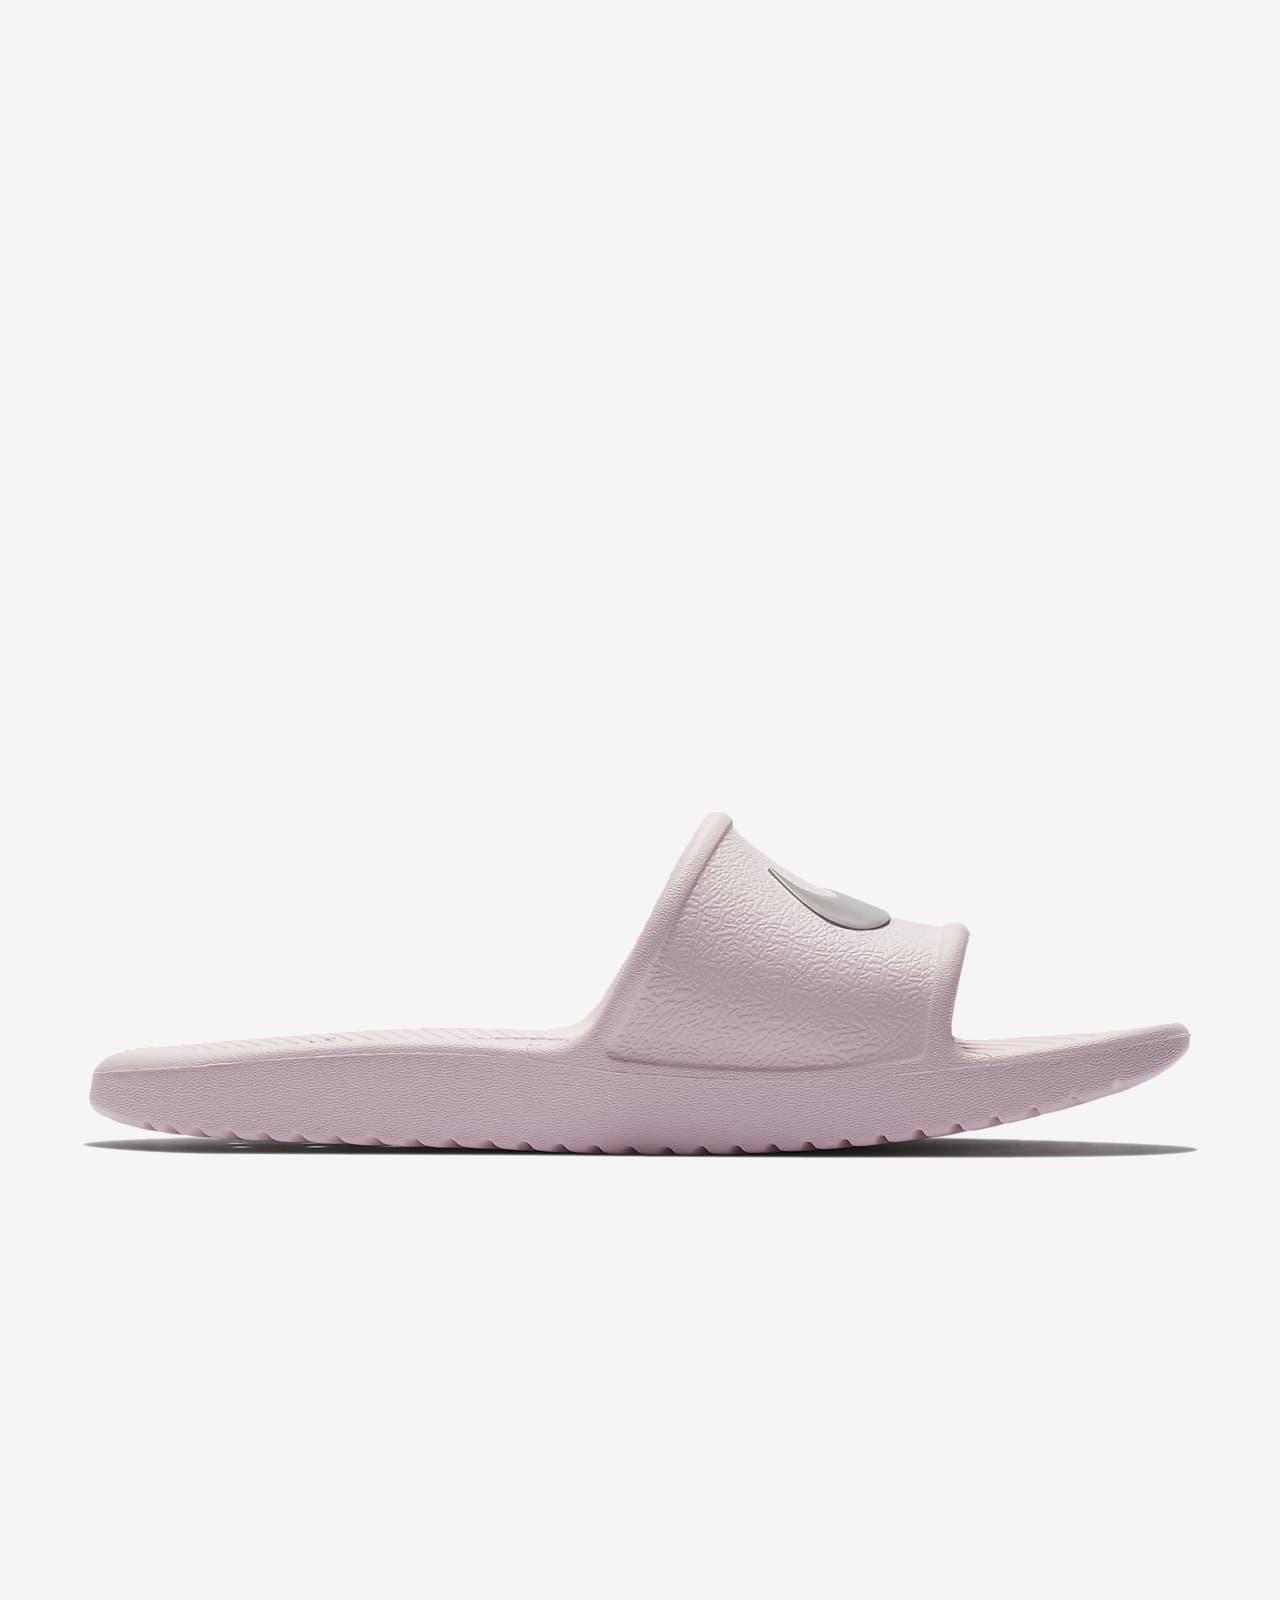 Nike Kawa Women's Slides